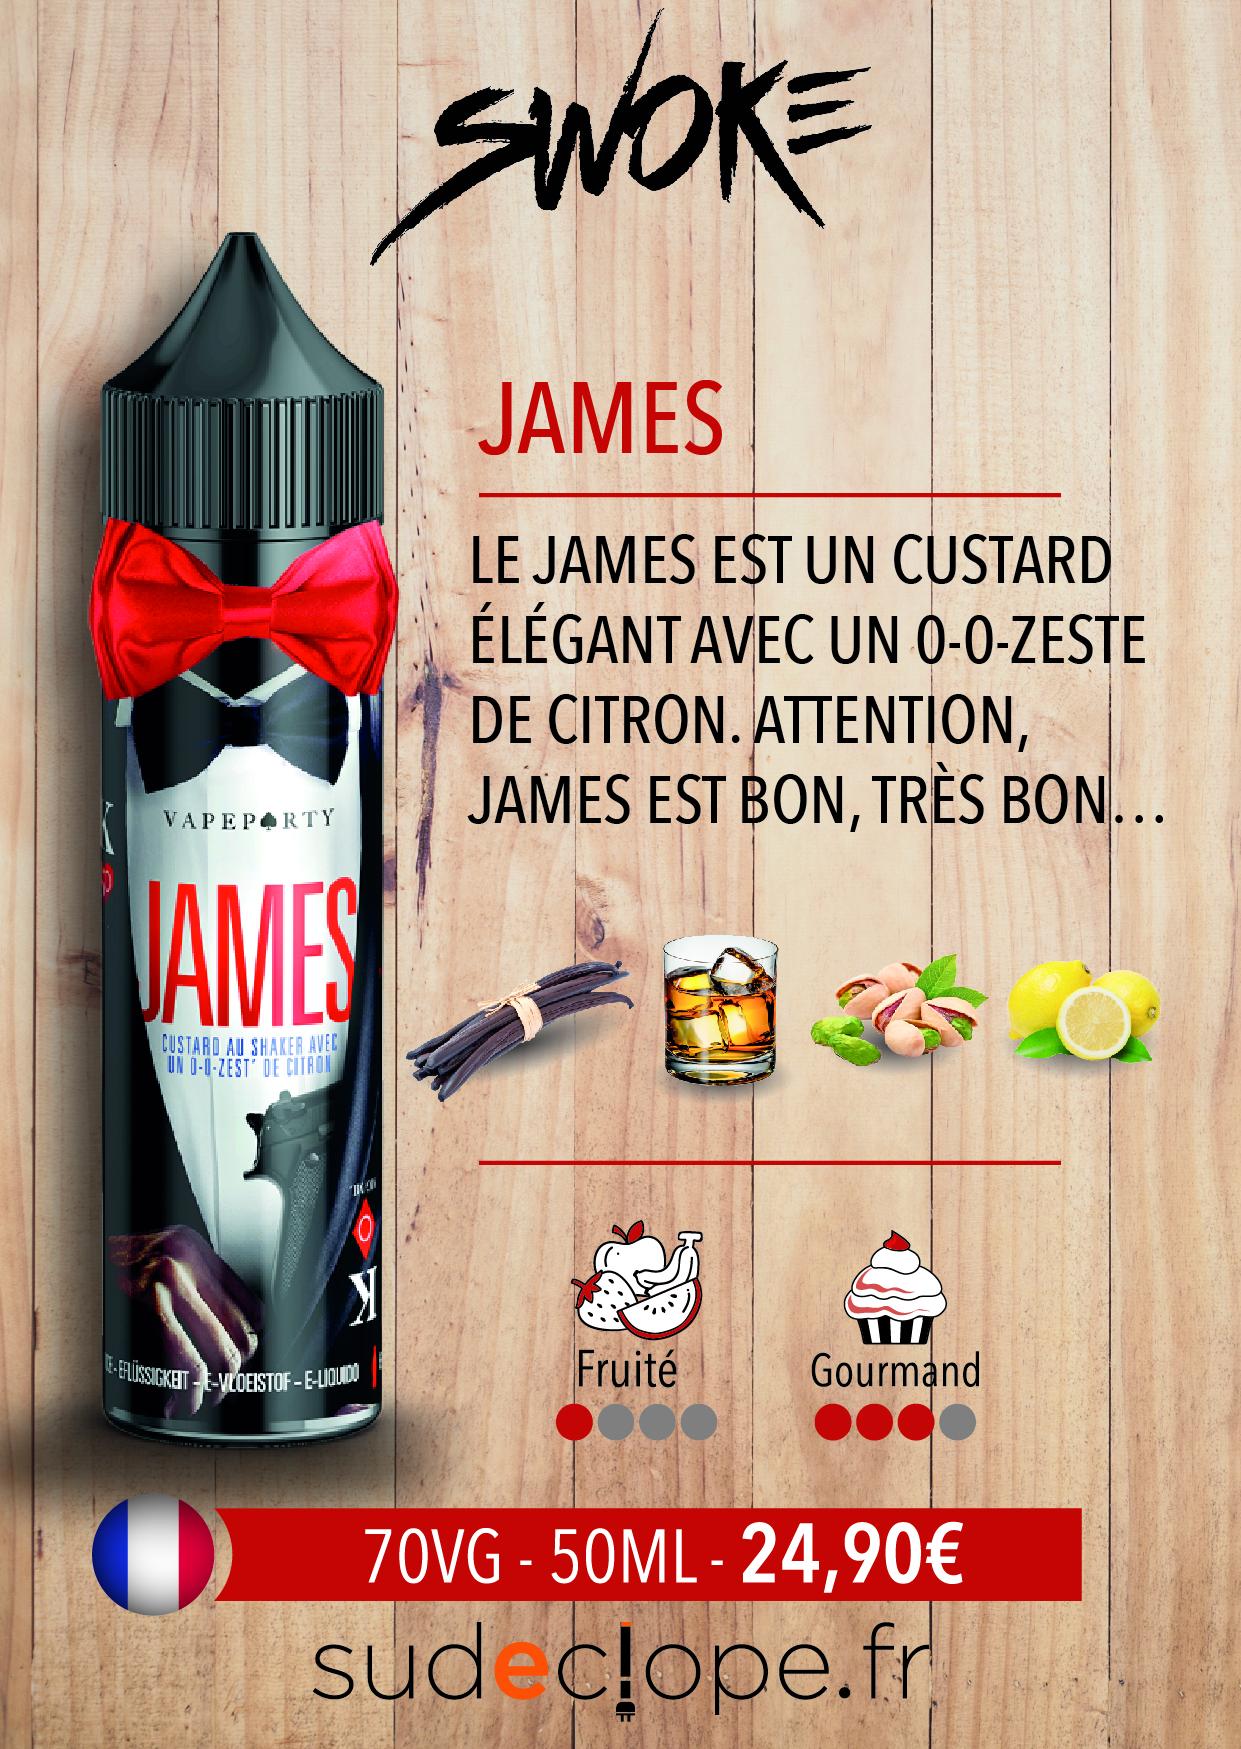 SWOKE JAMES-07.jpg